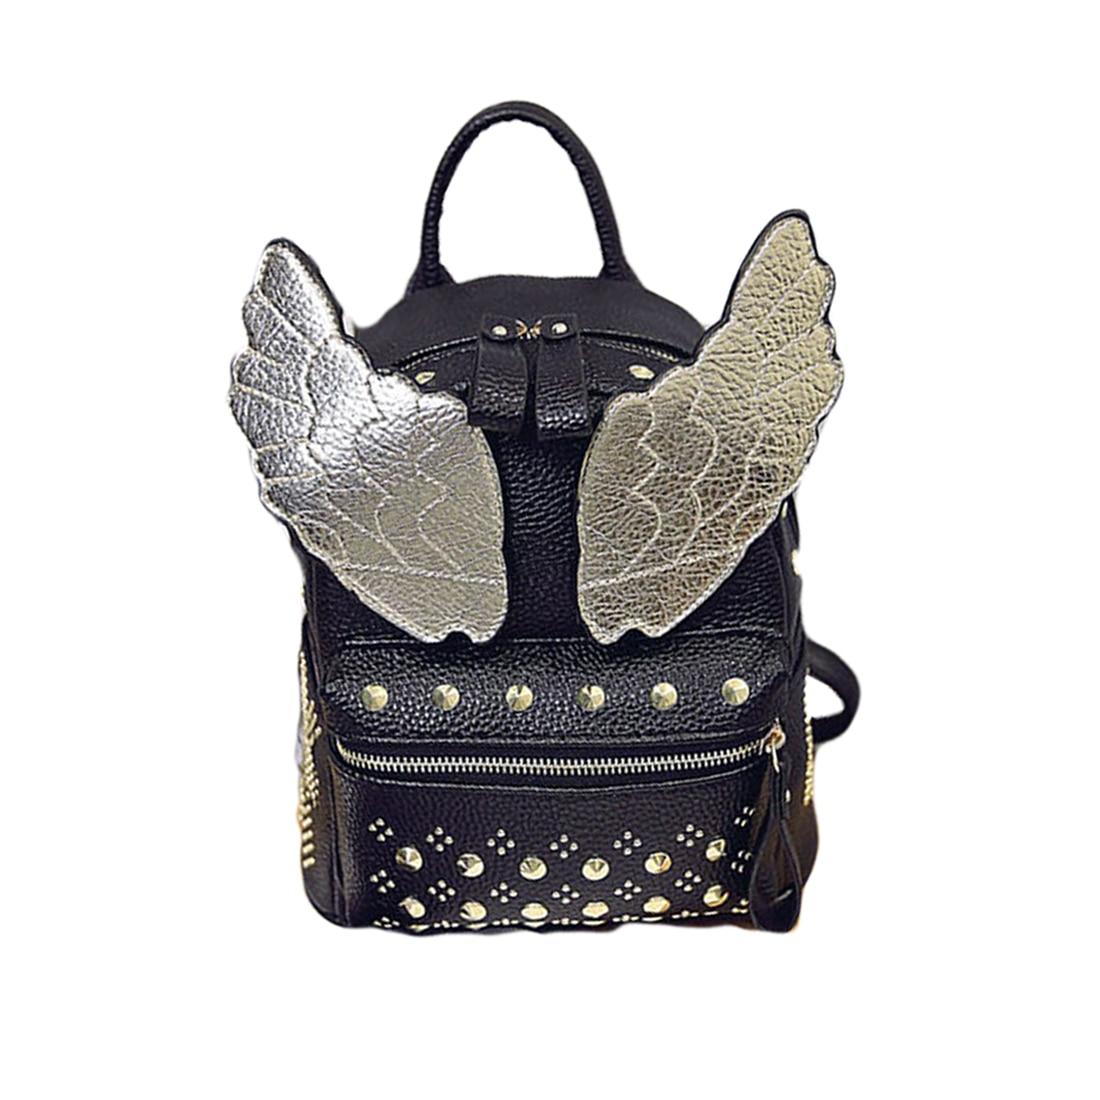 2017 Fashion Casual PU Leather Angel Wings School Backpacks for Teenage Girls Mochila Bolsas Travel laptop